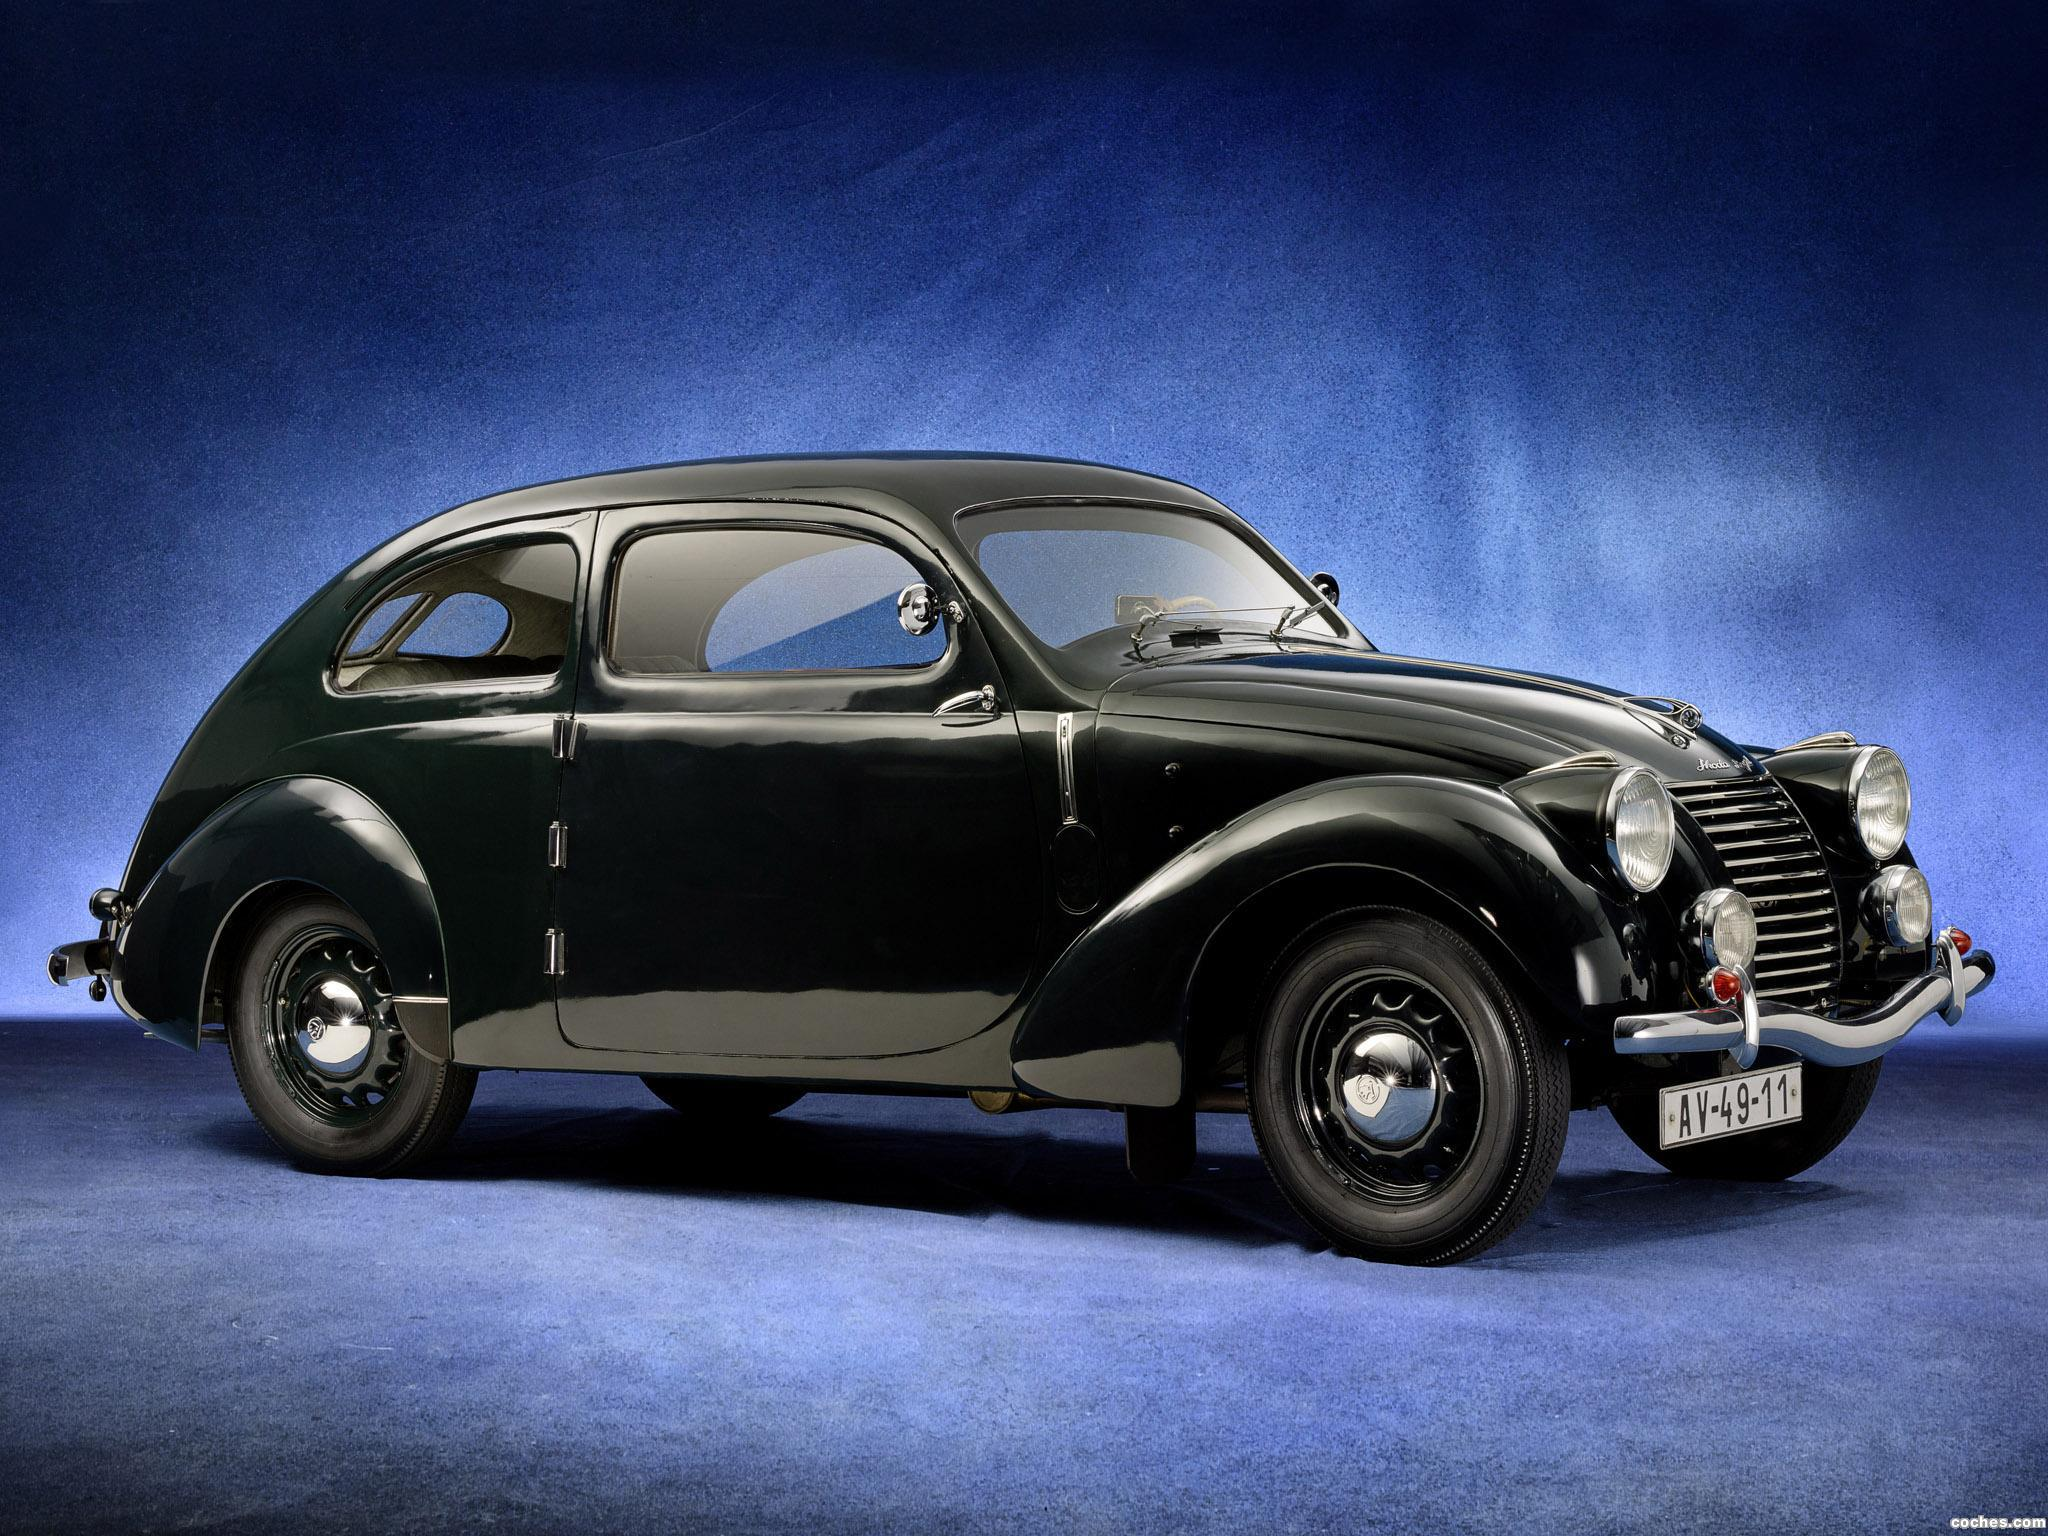 skoda_rapid-ohv-streamlined-tudor-type-922-1939_r1